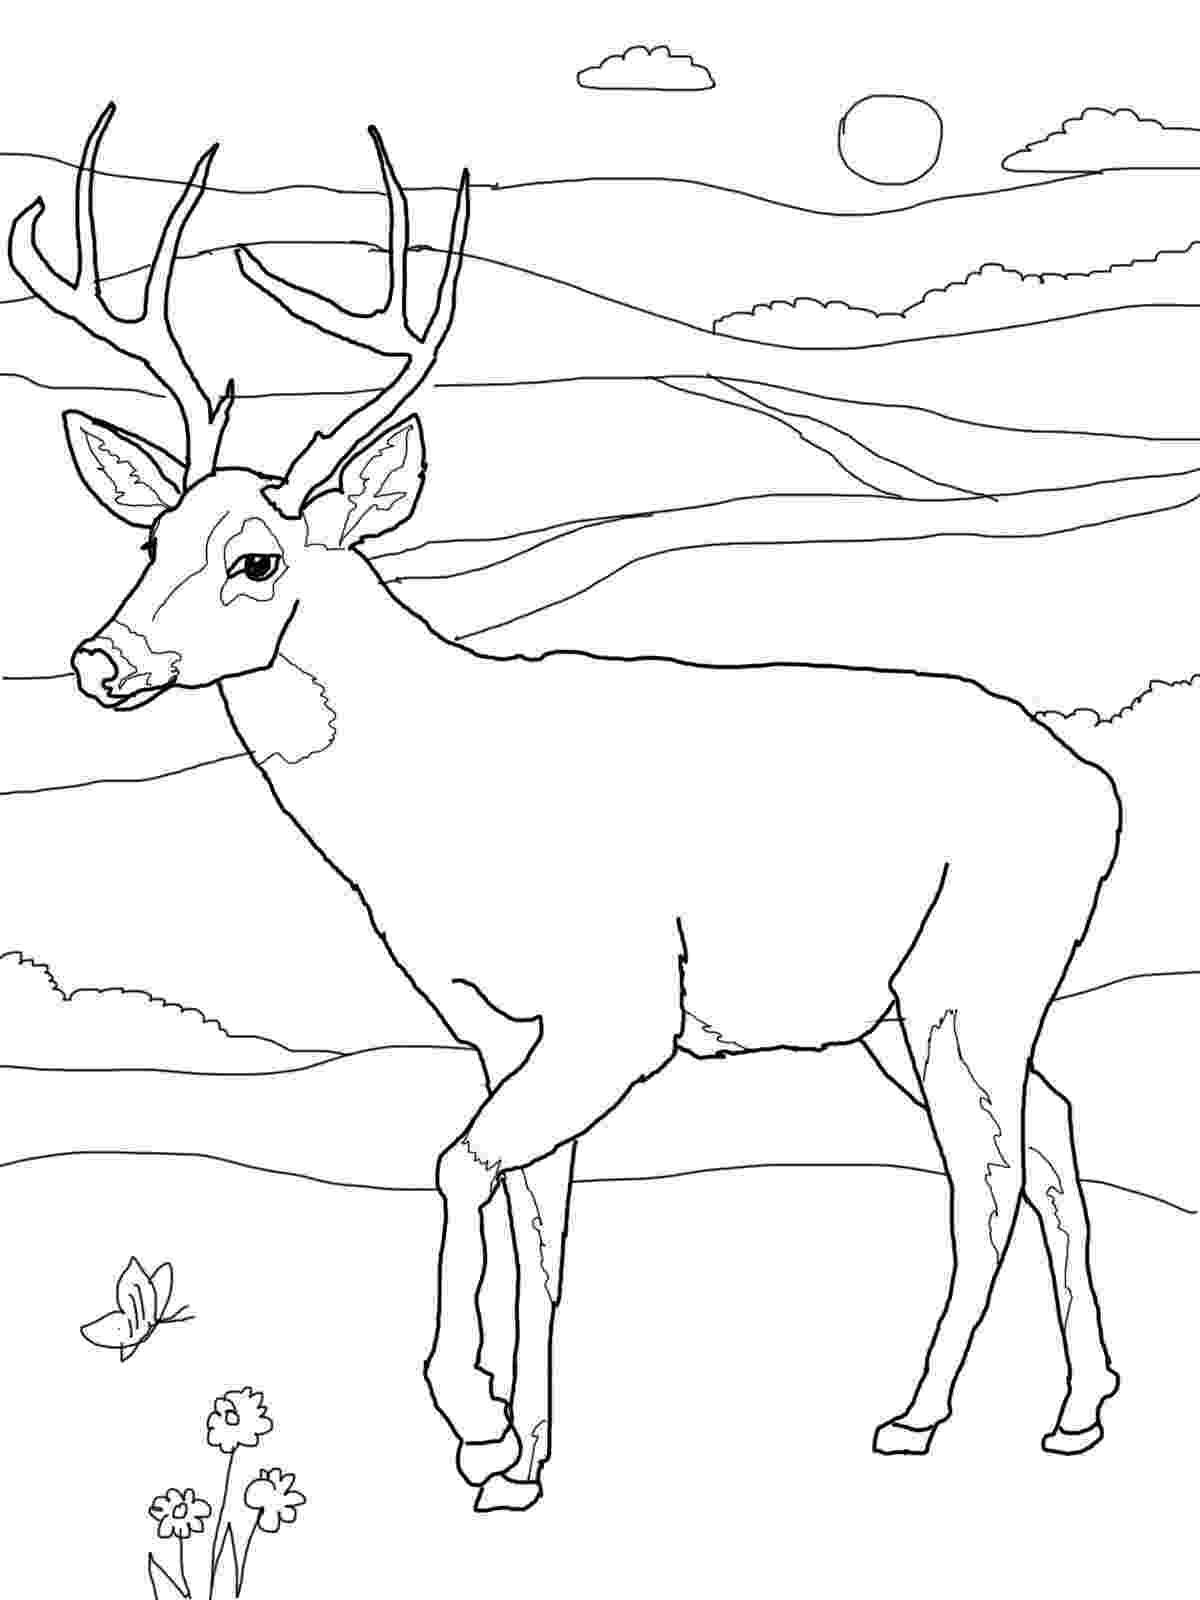 hunting coloring pictures free printable deer coloring pages for kids hunting pictures coloring